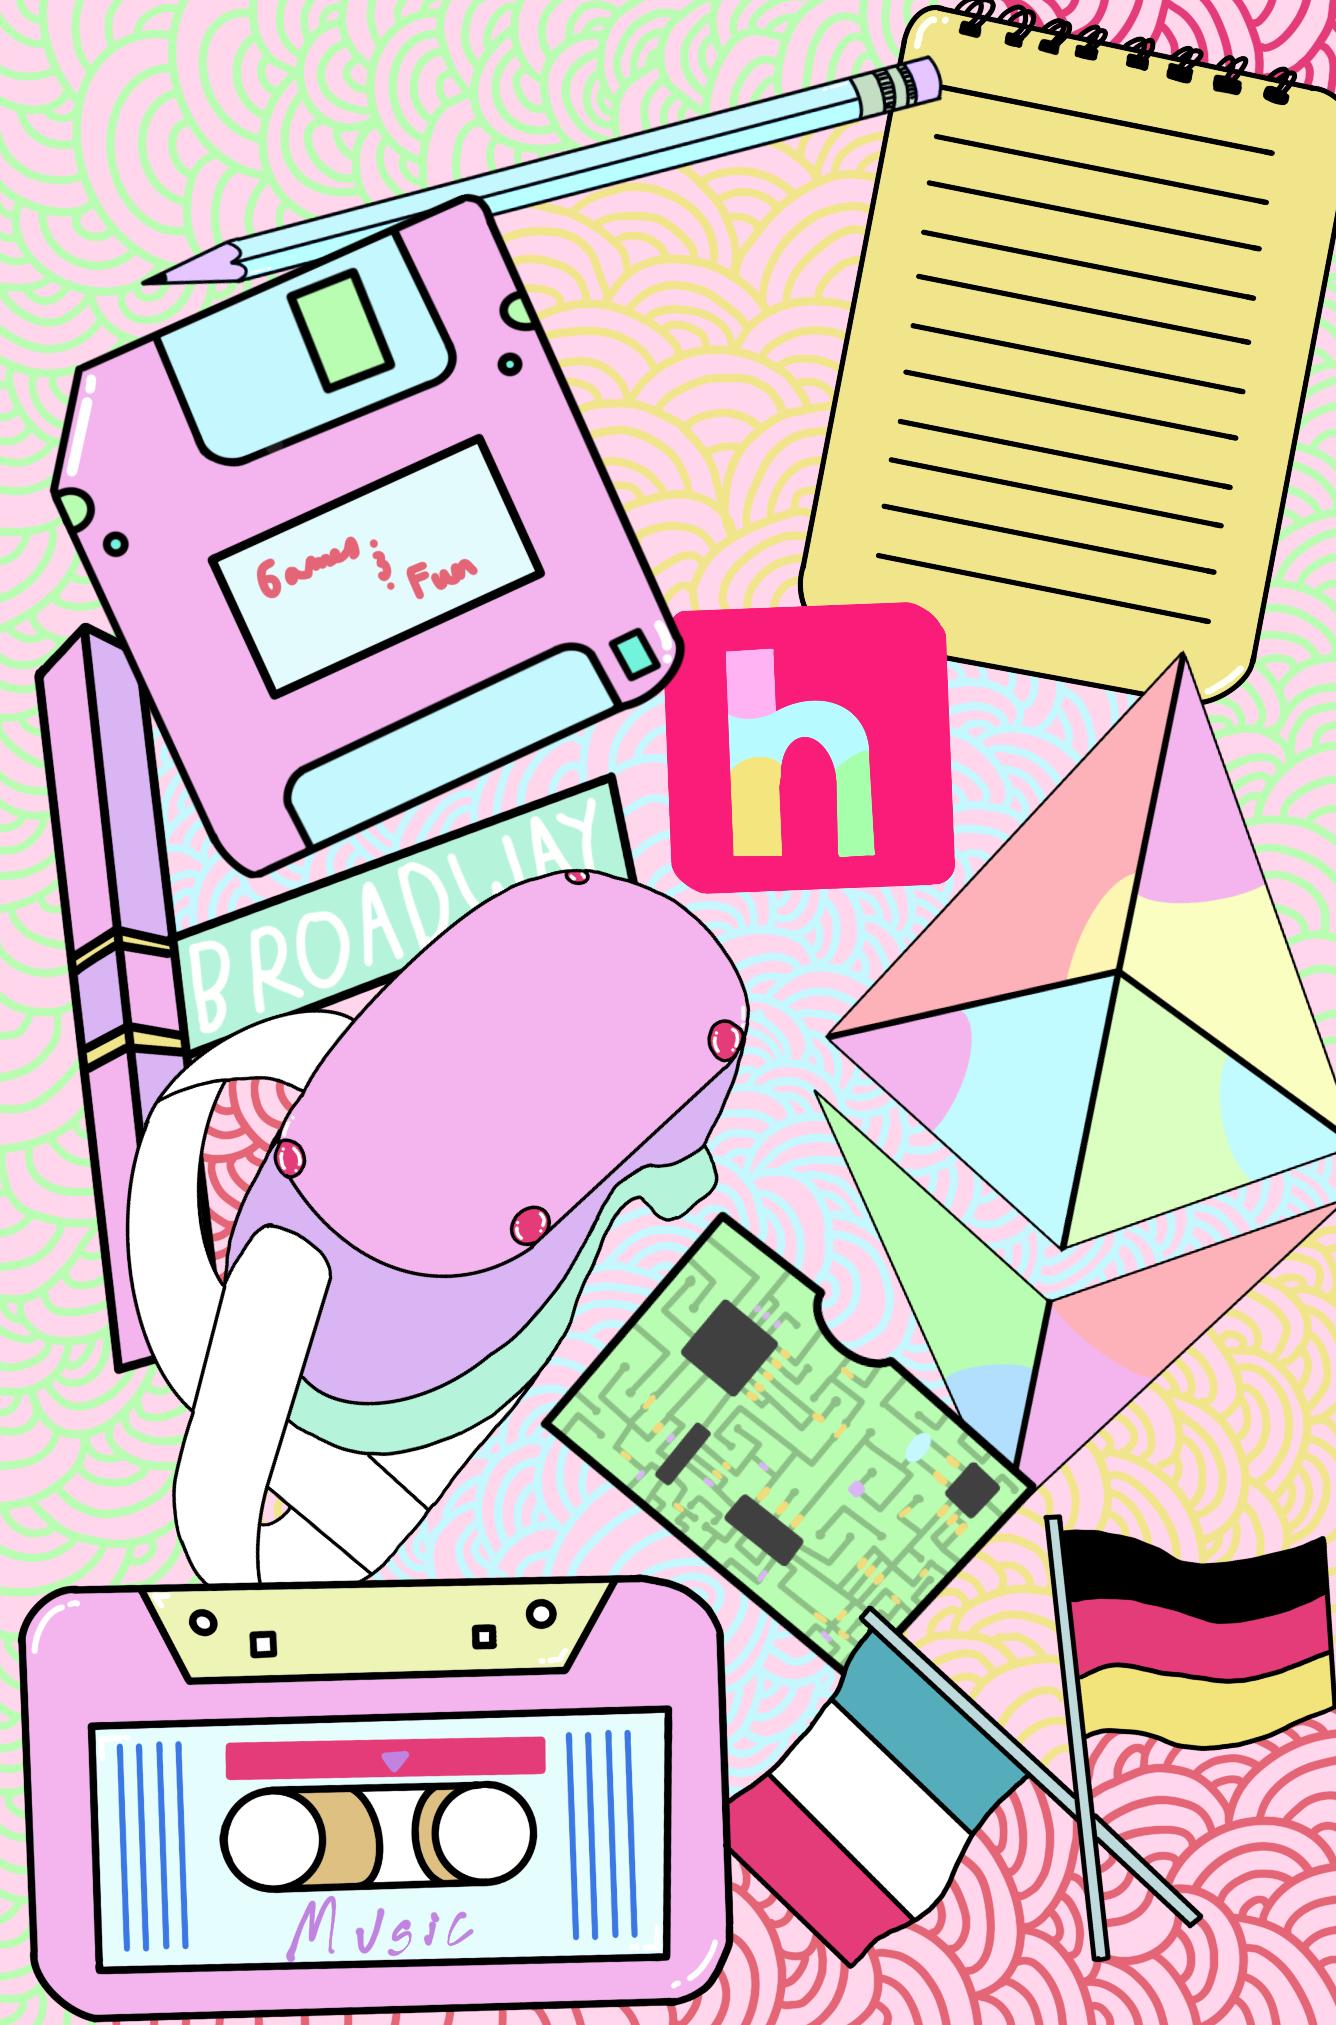 https://cloud-3r0h6aqh5-hack-club-bot.vercel.app/0untitled-artwork.png